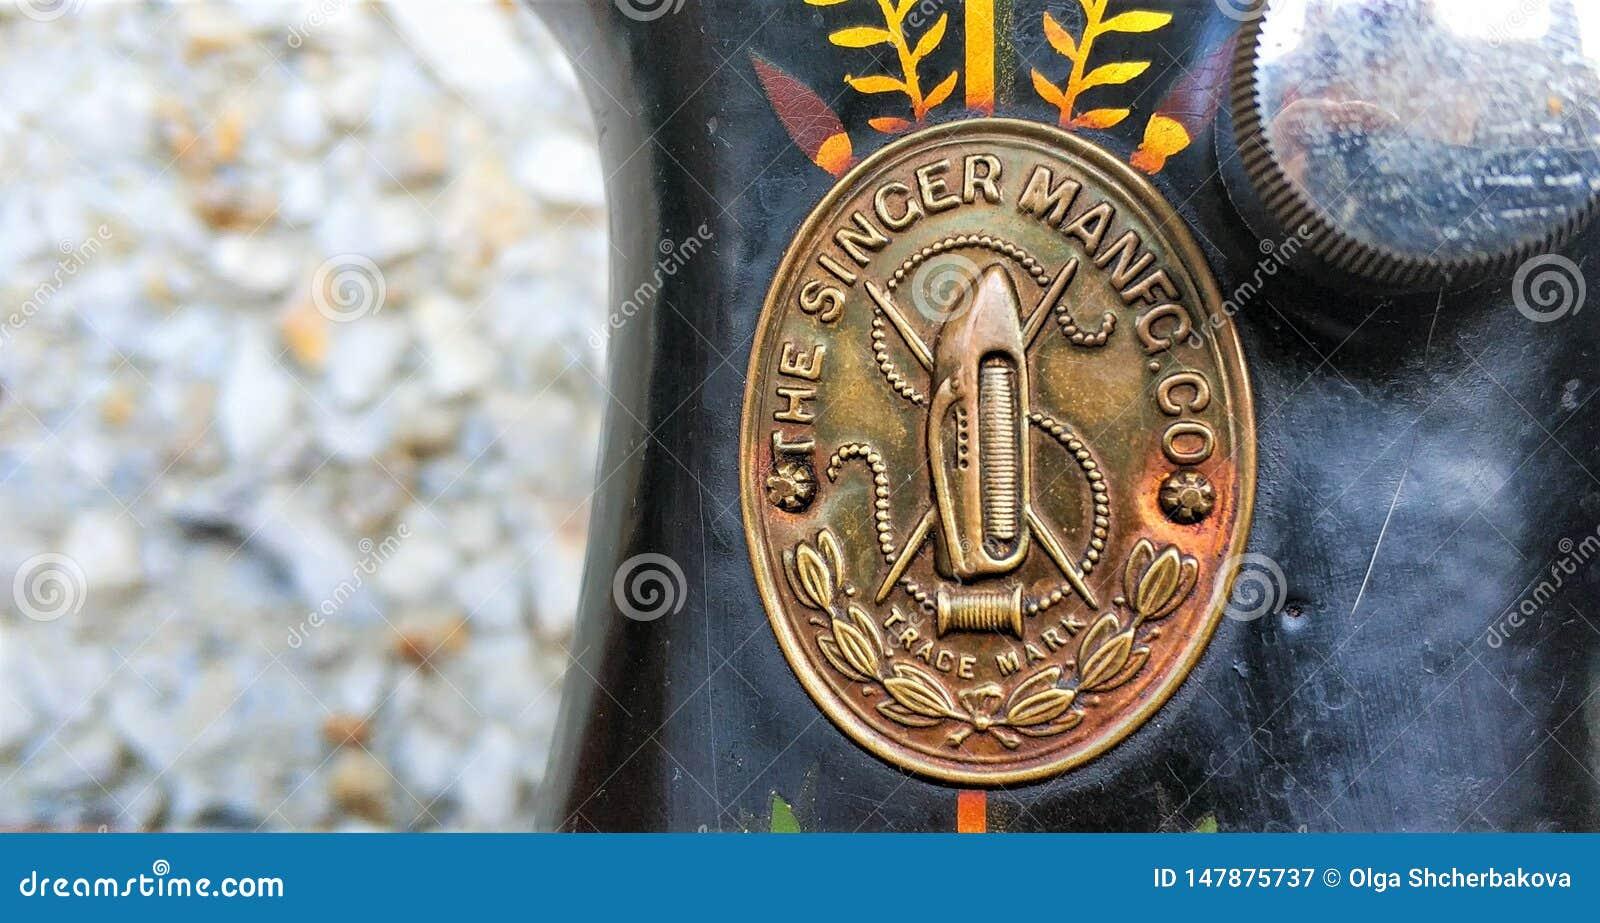 Old sewing machine vintage retro close up. Singer Factory Emblem